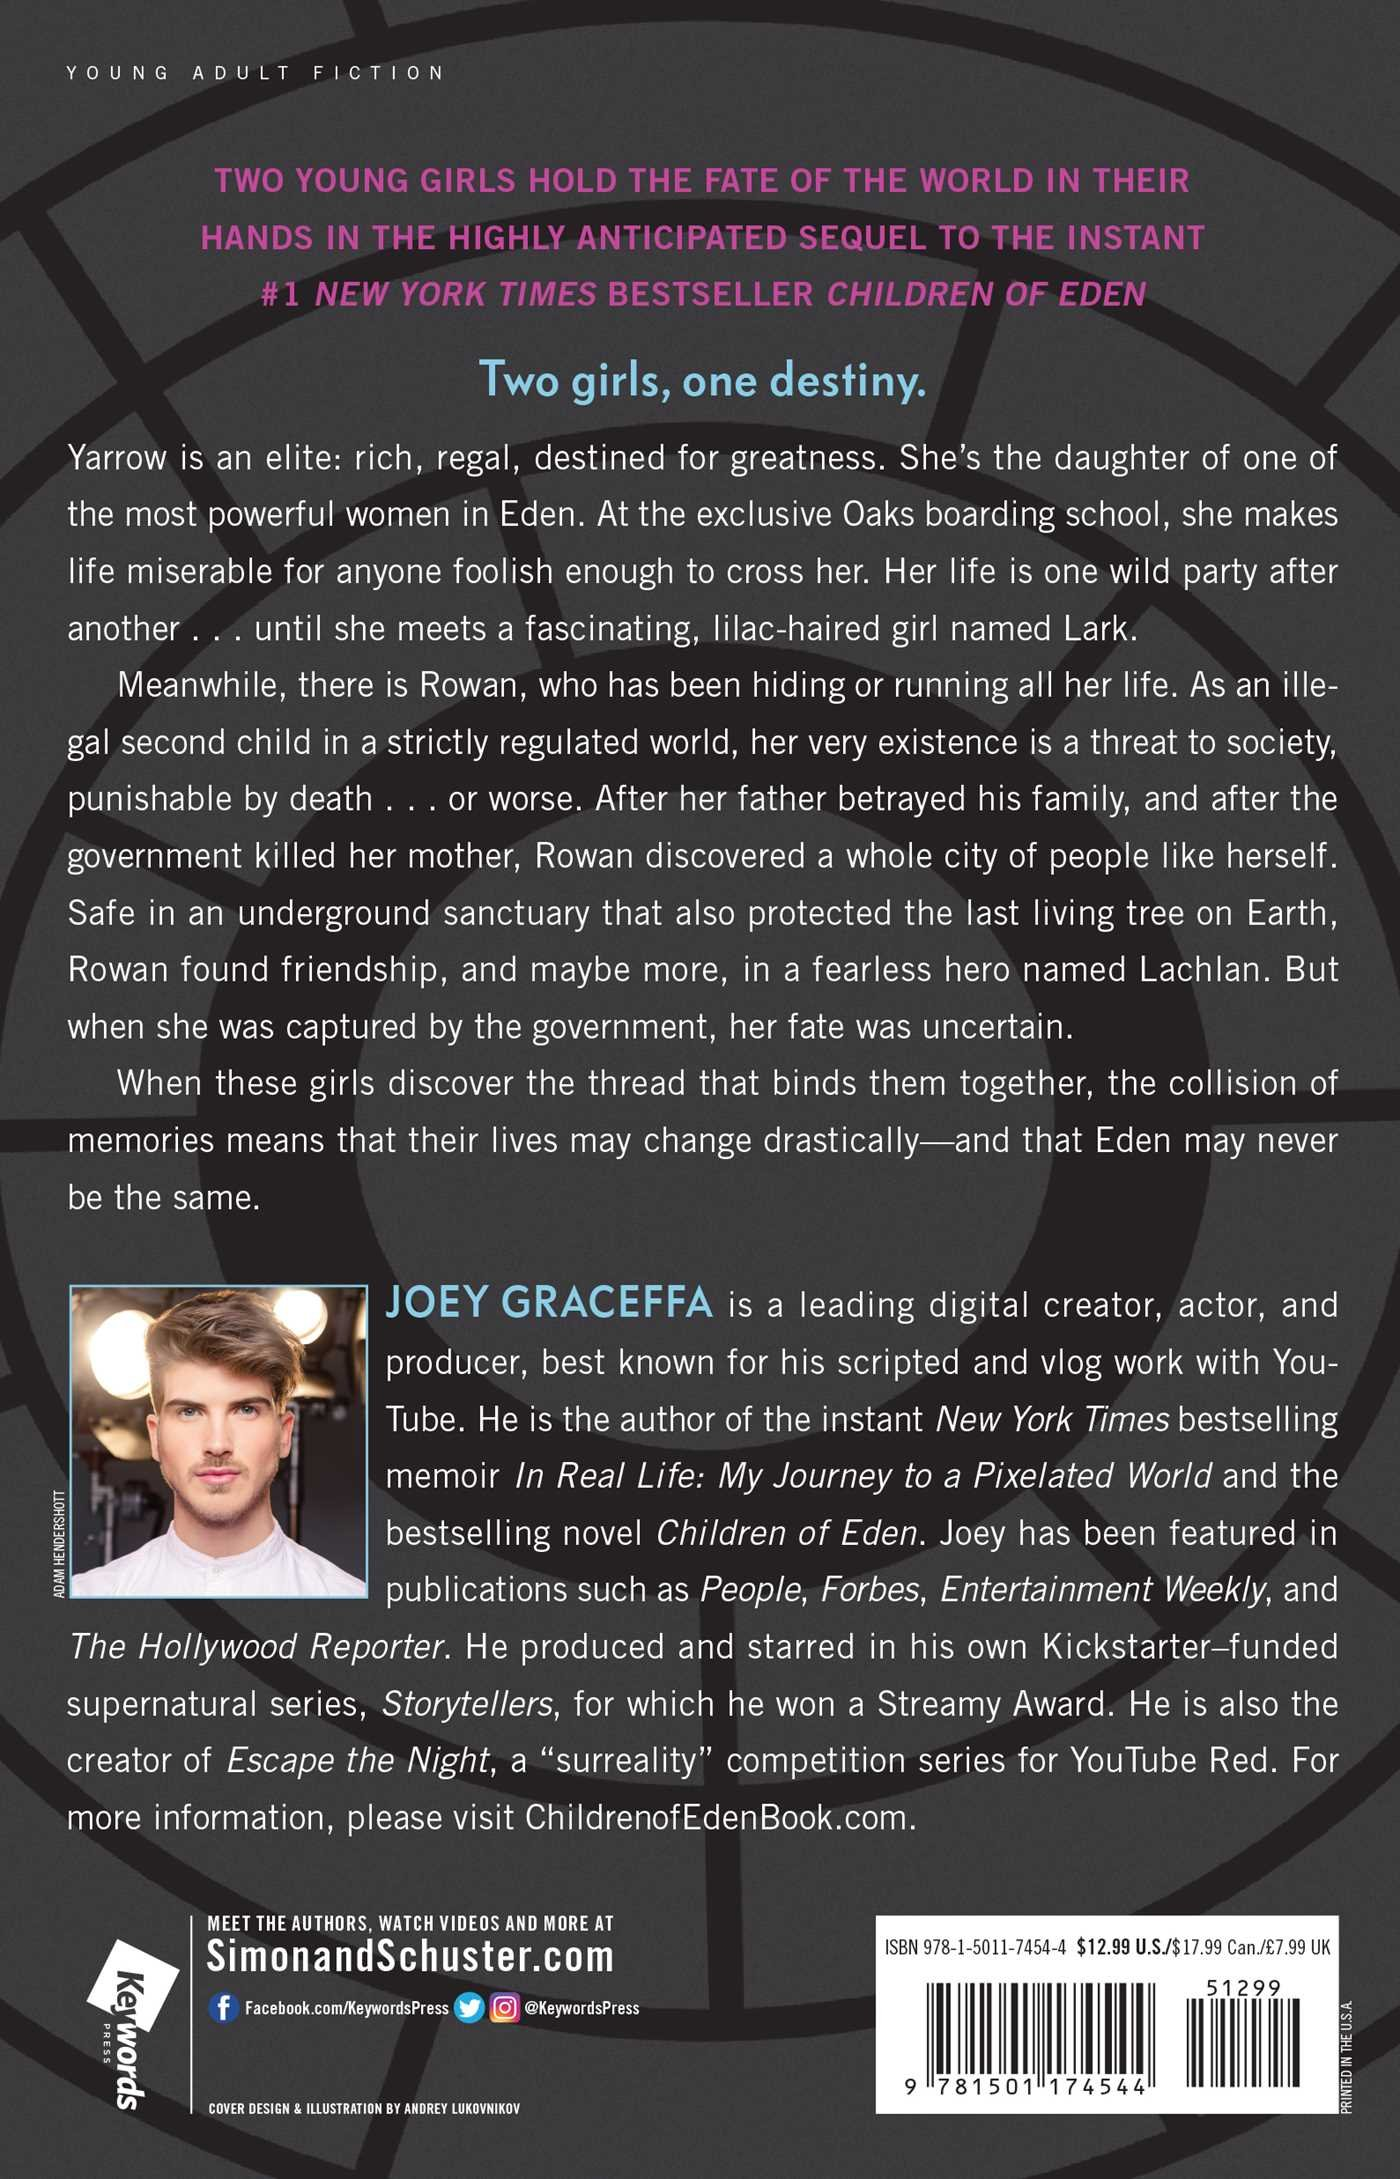 Amazon.com: Elites of Eden: A Novel (Children of Eden) (9781501174544):  Joey Graceffa: Books